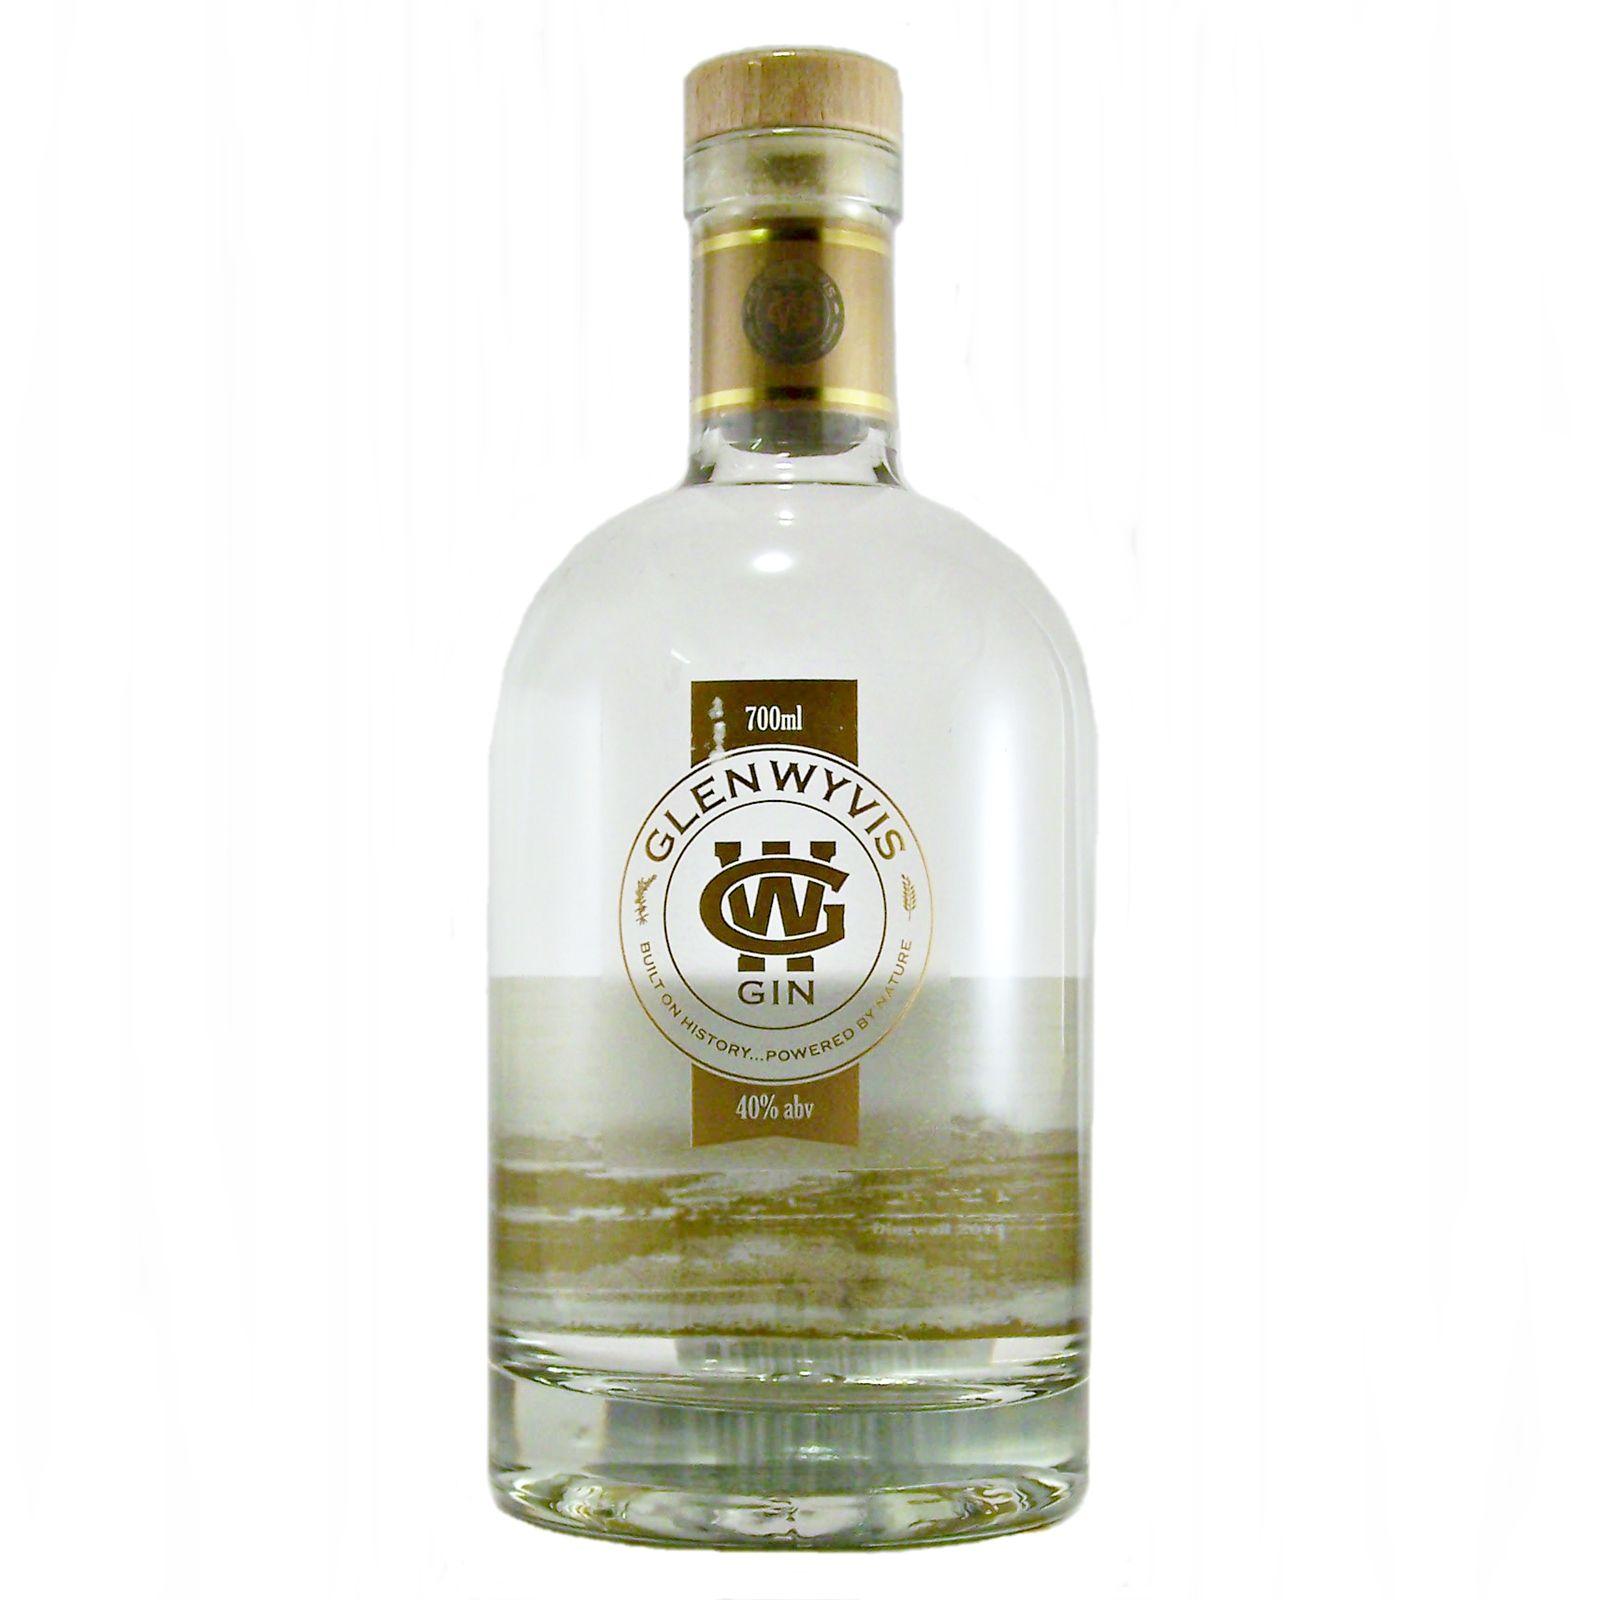 york gin. glenwyvis gin is made in shetland for glen wyvis whisky distillery available to buy online at york e